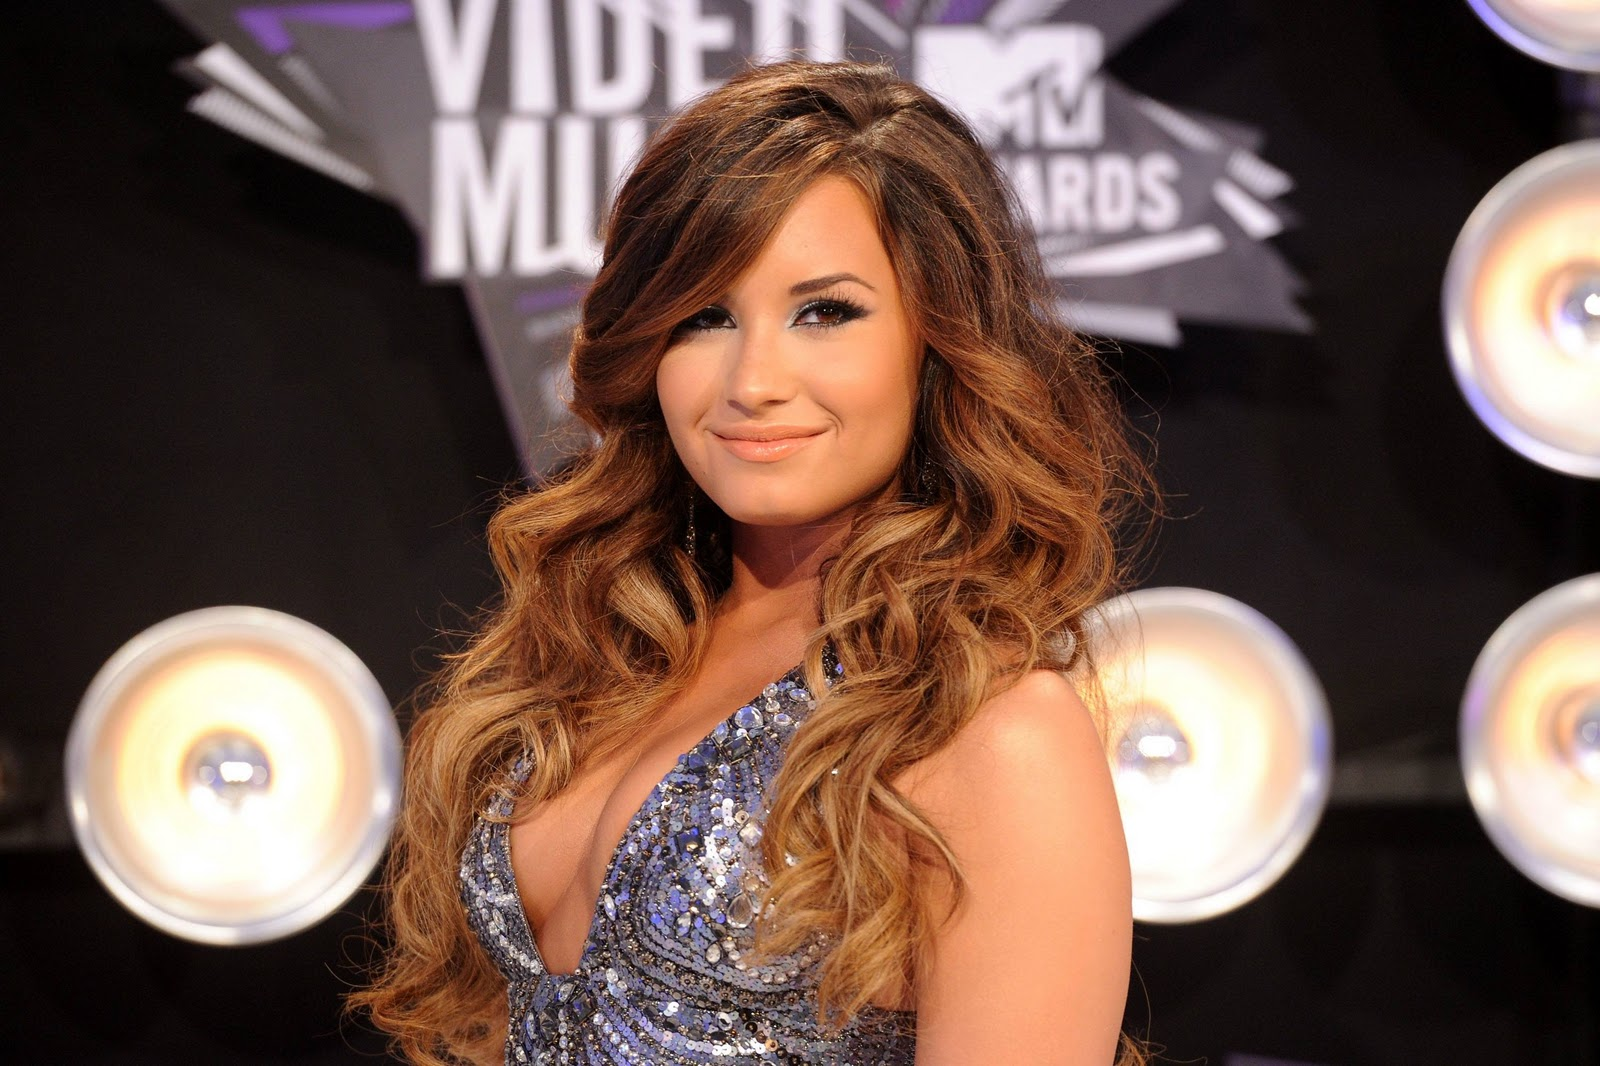 http://2.bp.blogspot.com/-2j0dphYcOYo/Tr5oC5j0MJI/AAAAAAAADWs/UG_Gtv8qVA8/s1600/Demi+Lovato+Hairstyle+Color2011.jpg